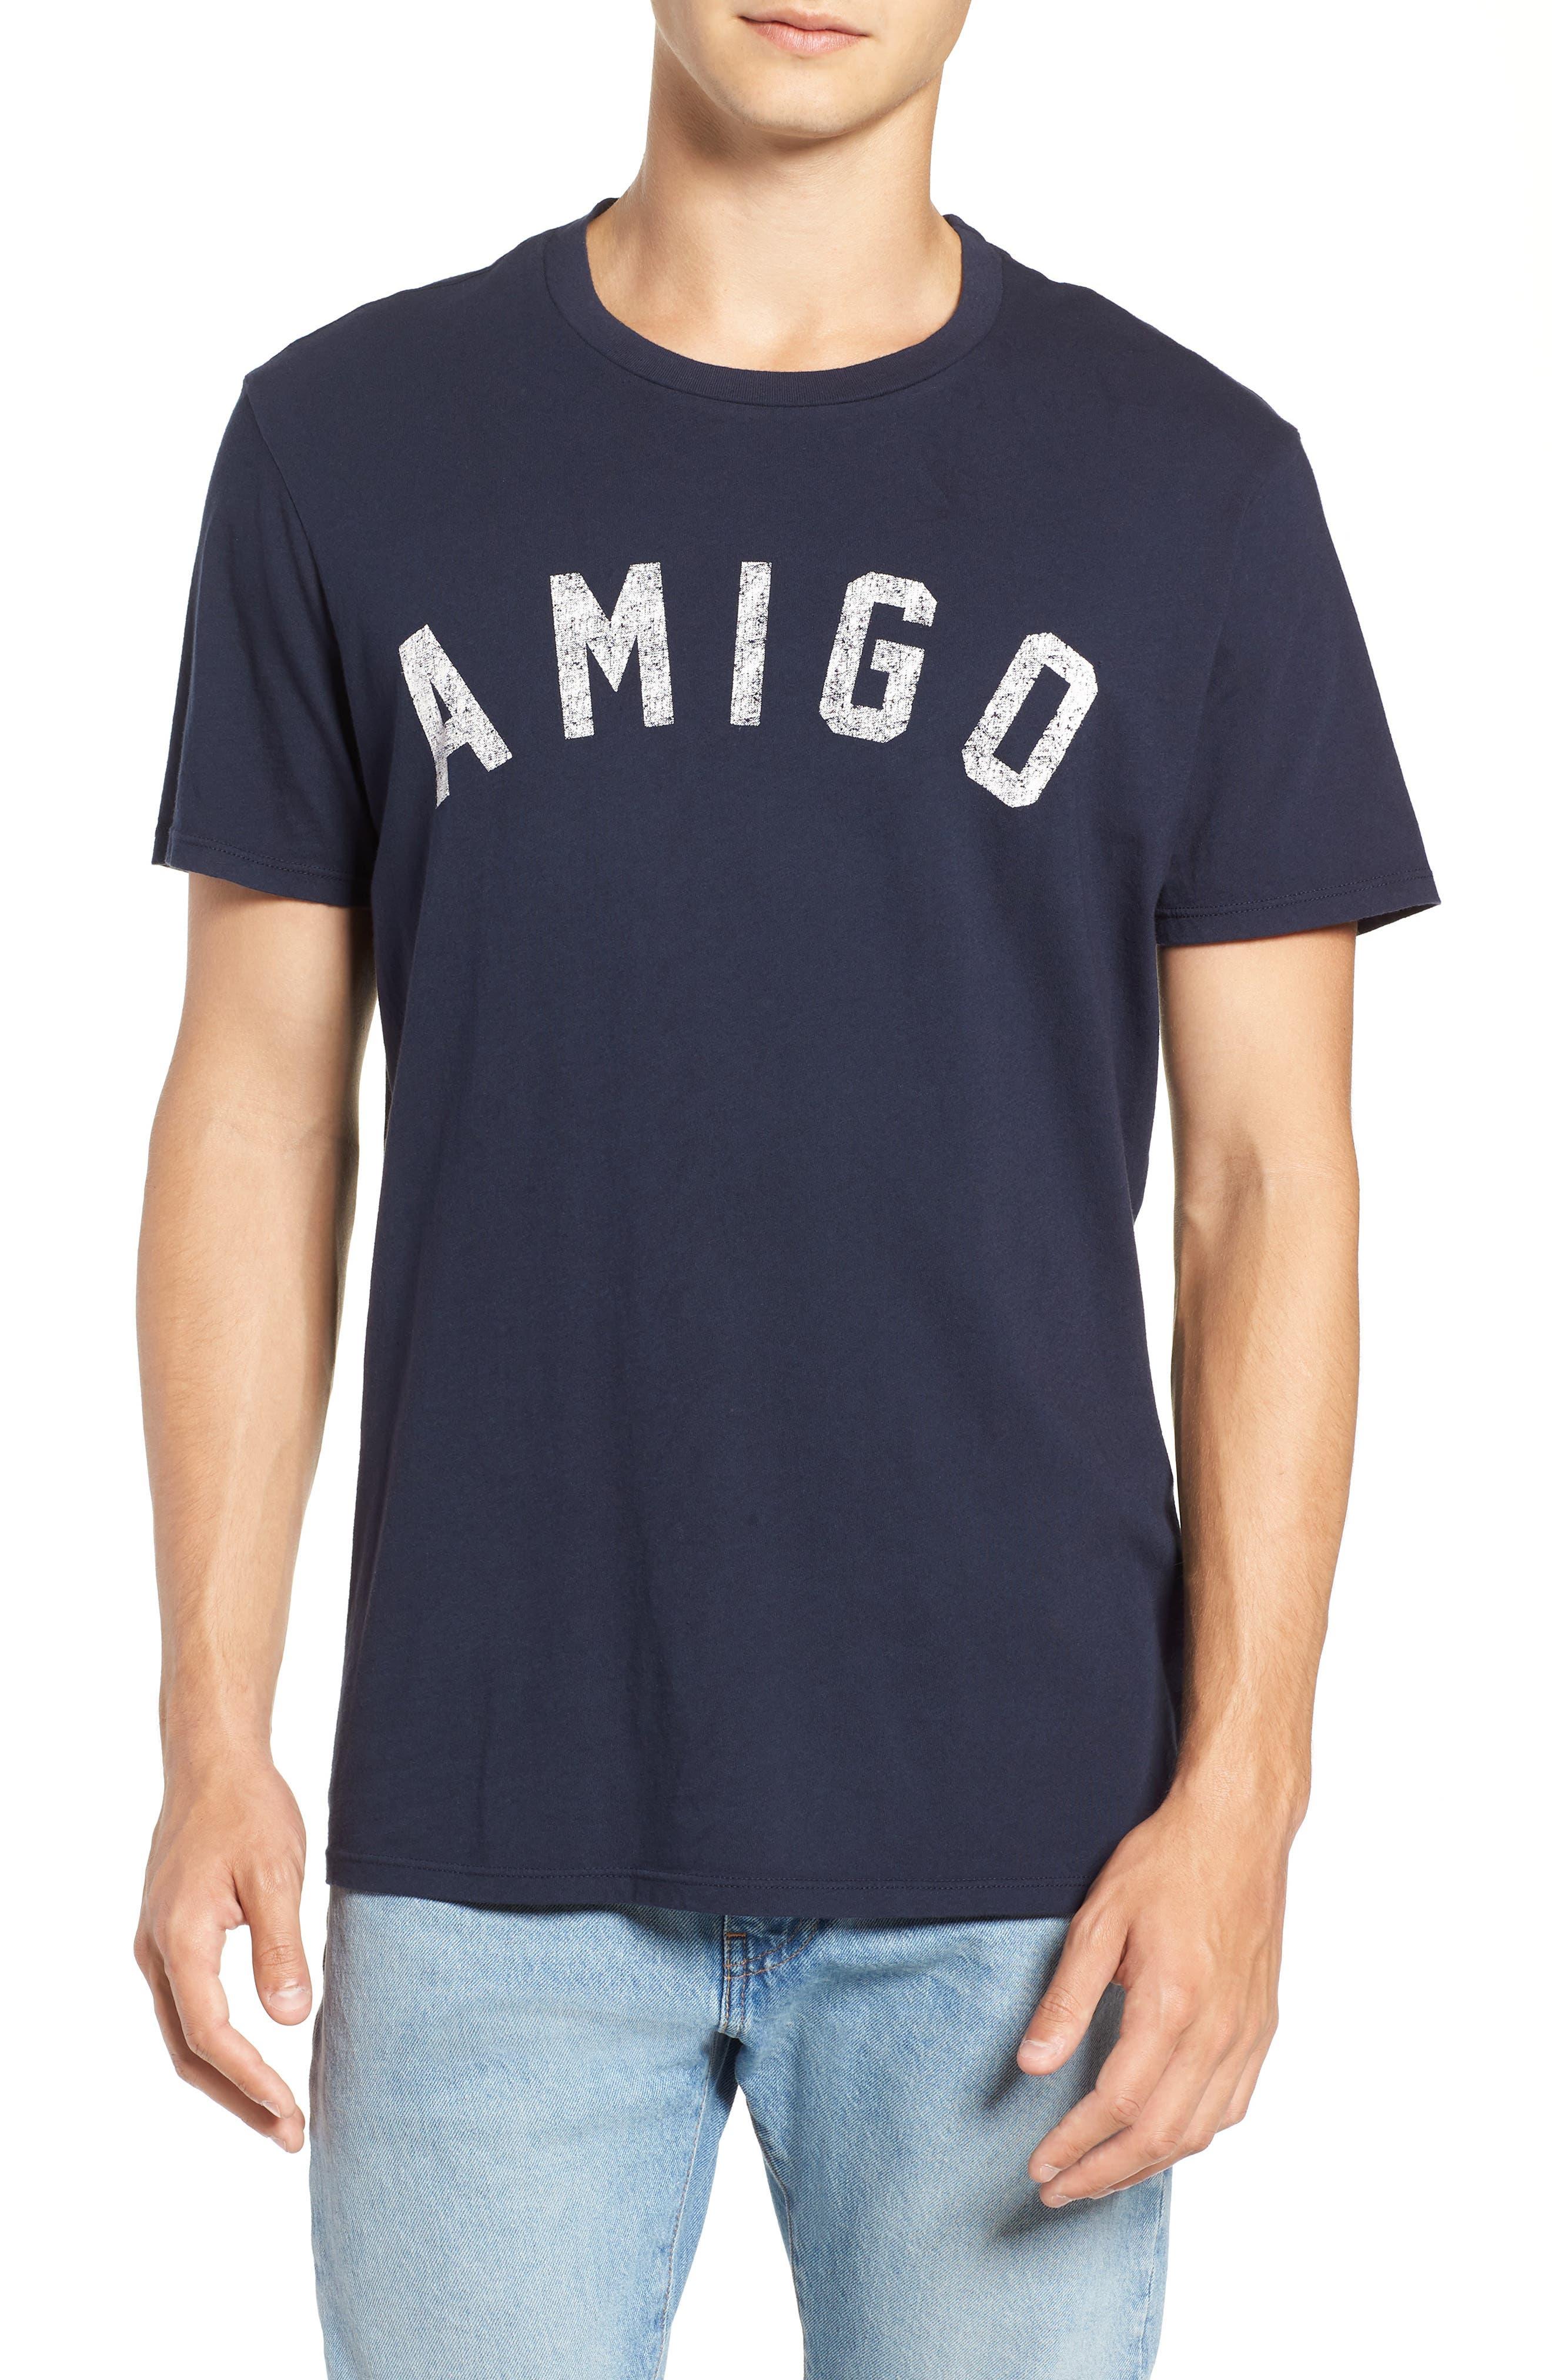 SOL ANGELES Men'S Amigo Graphic T-Shirt in Indigo